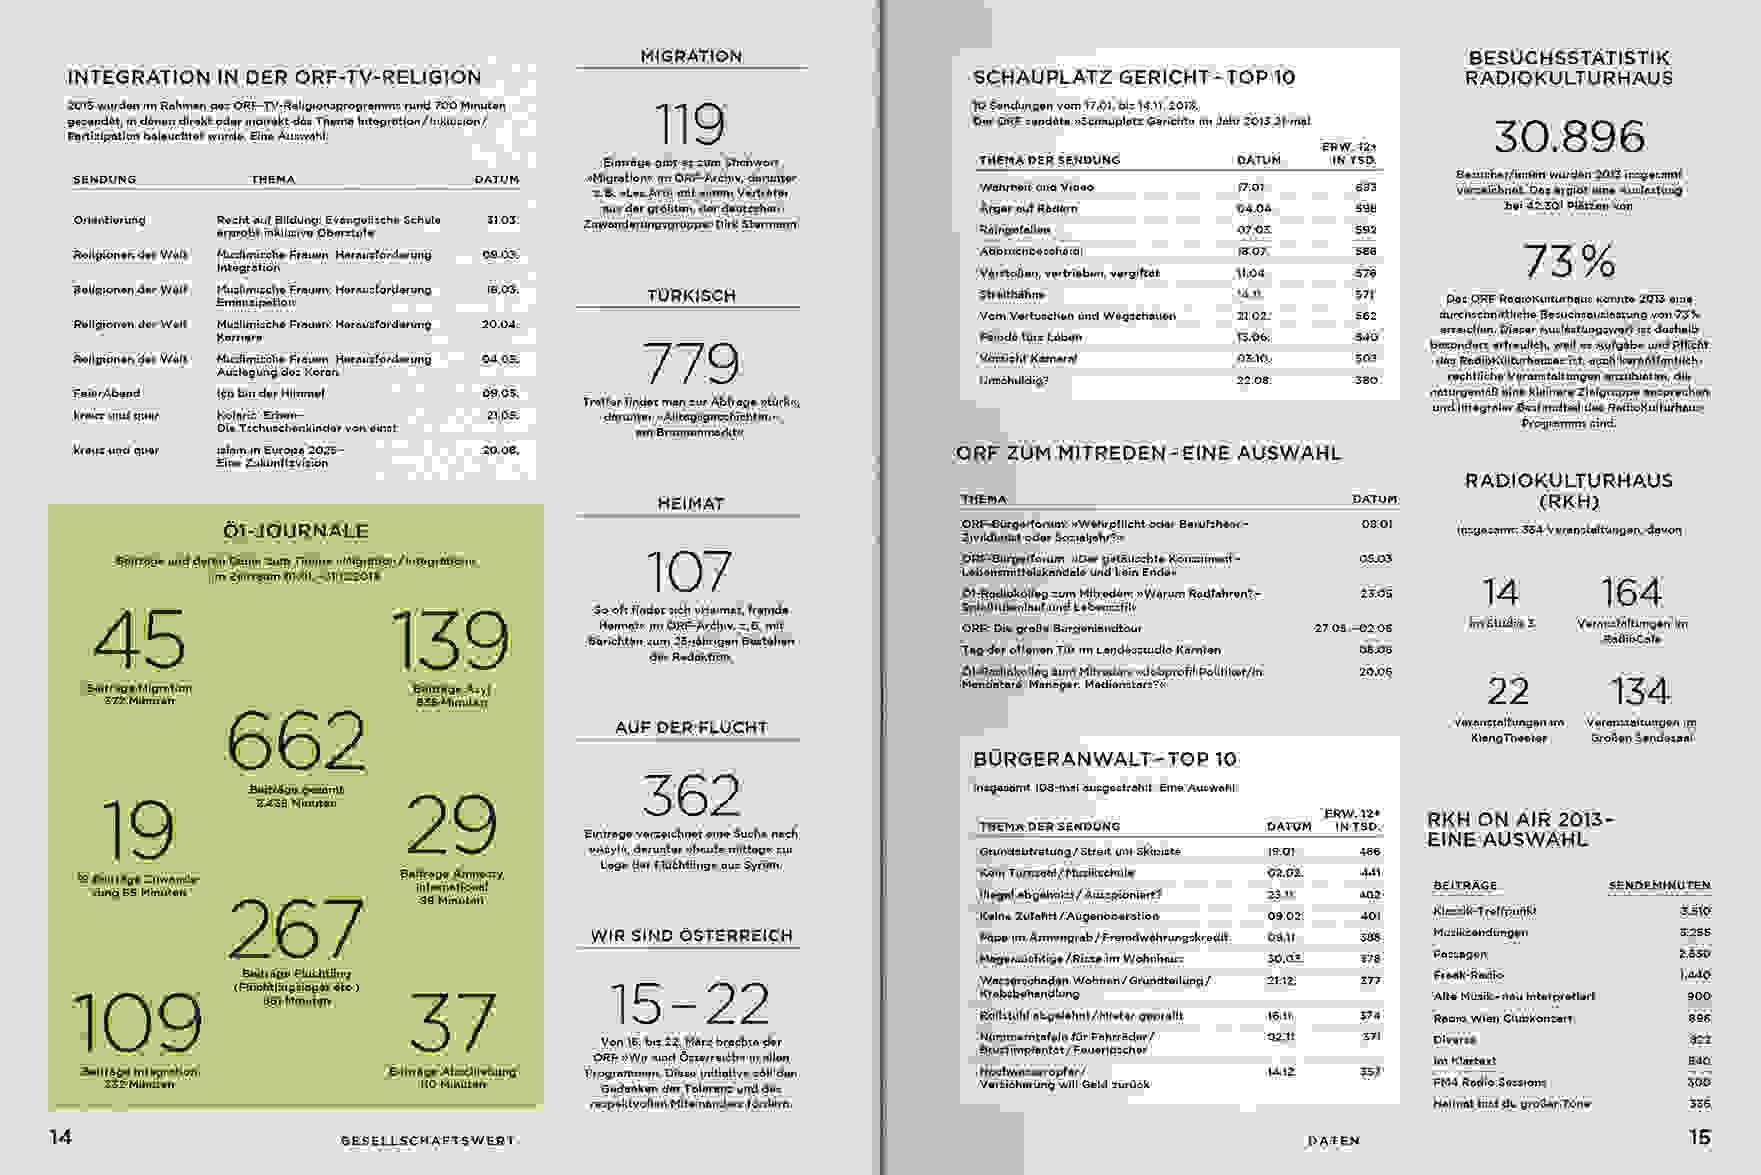 ORF PV 2014 Daten Doppelseite 4